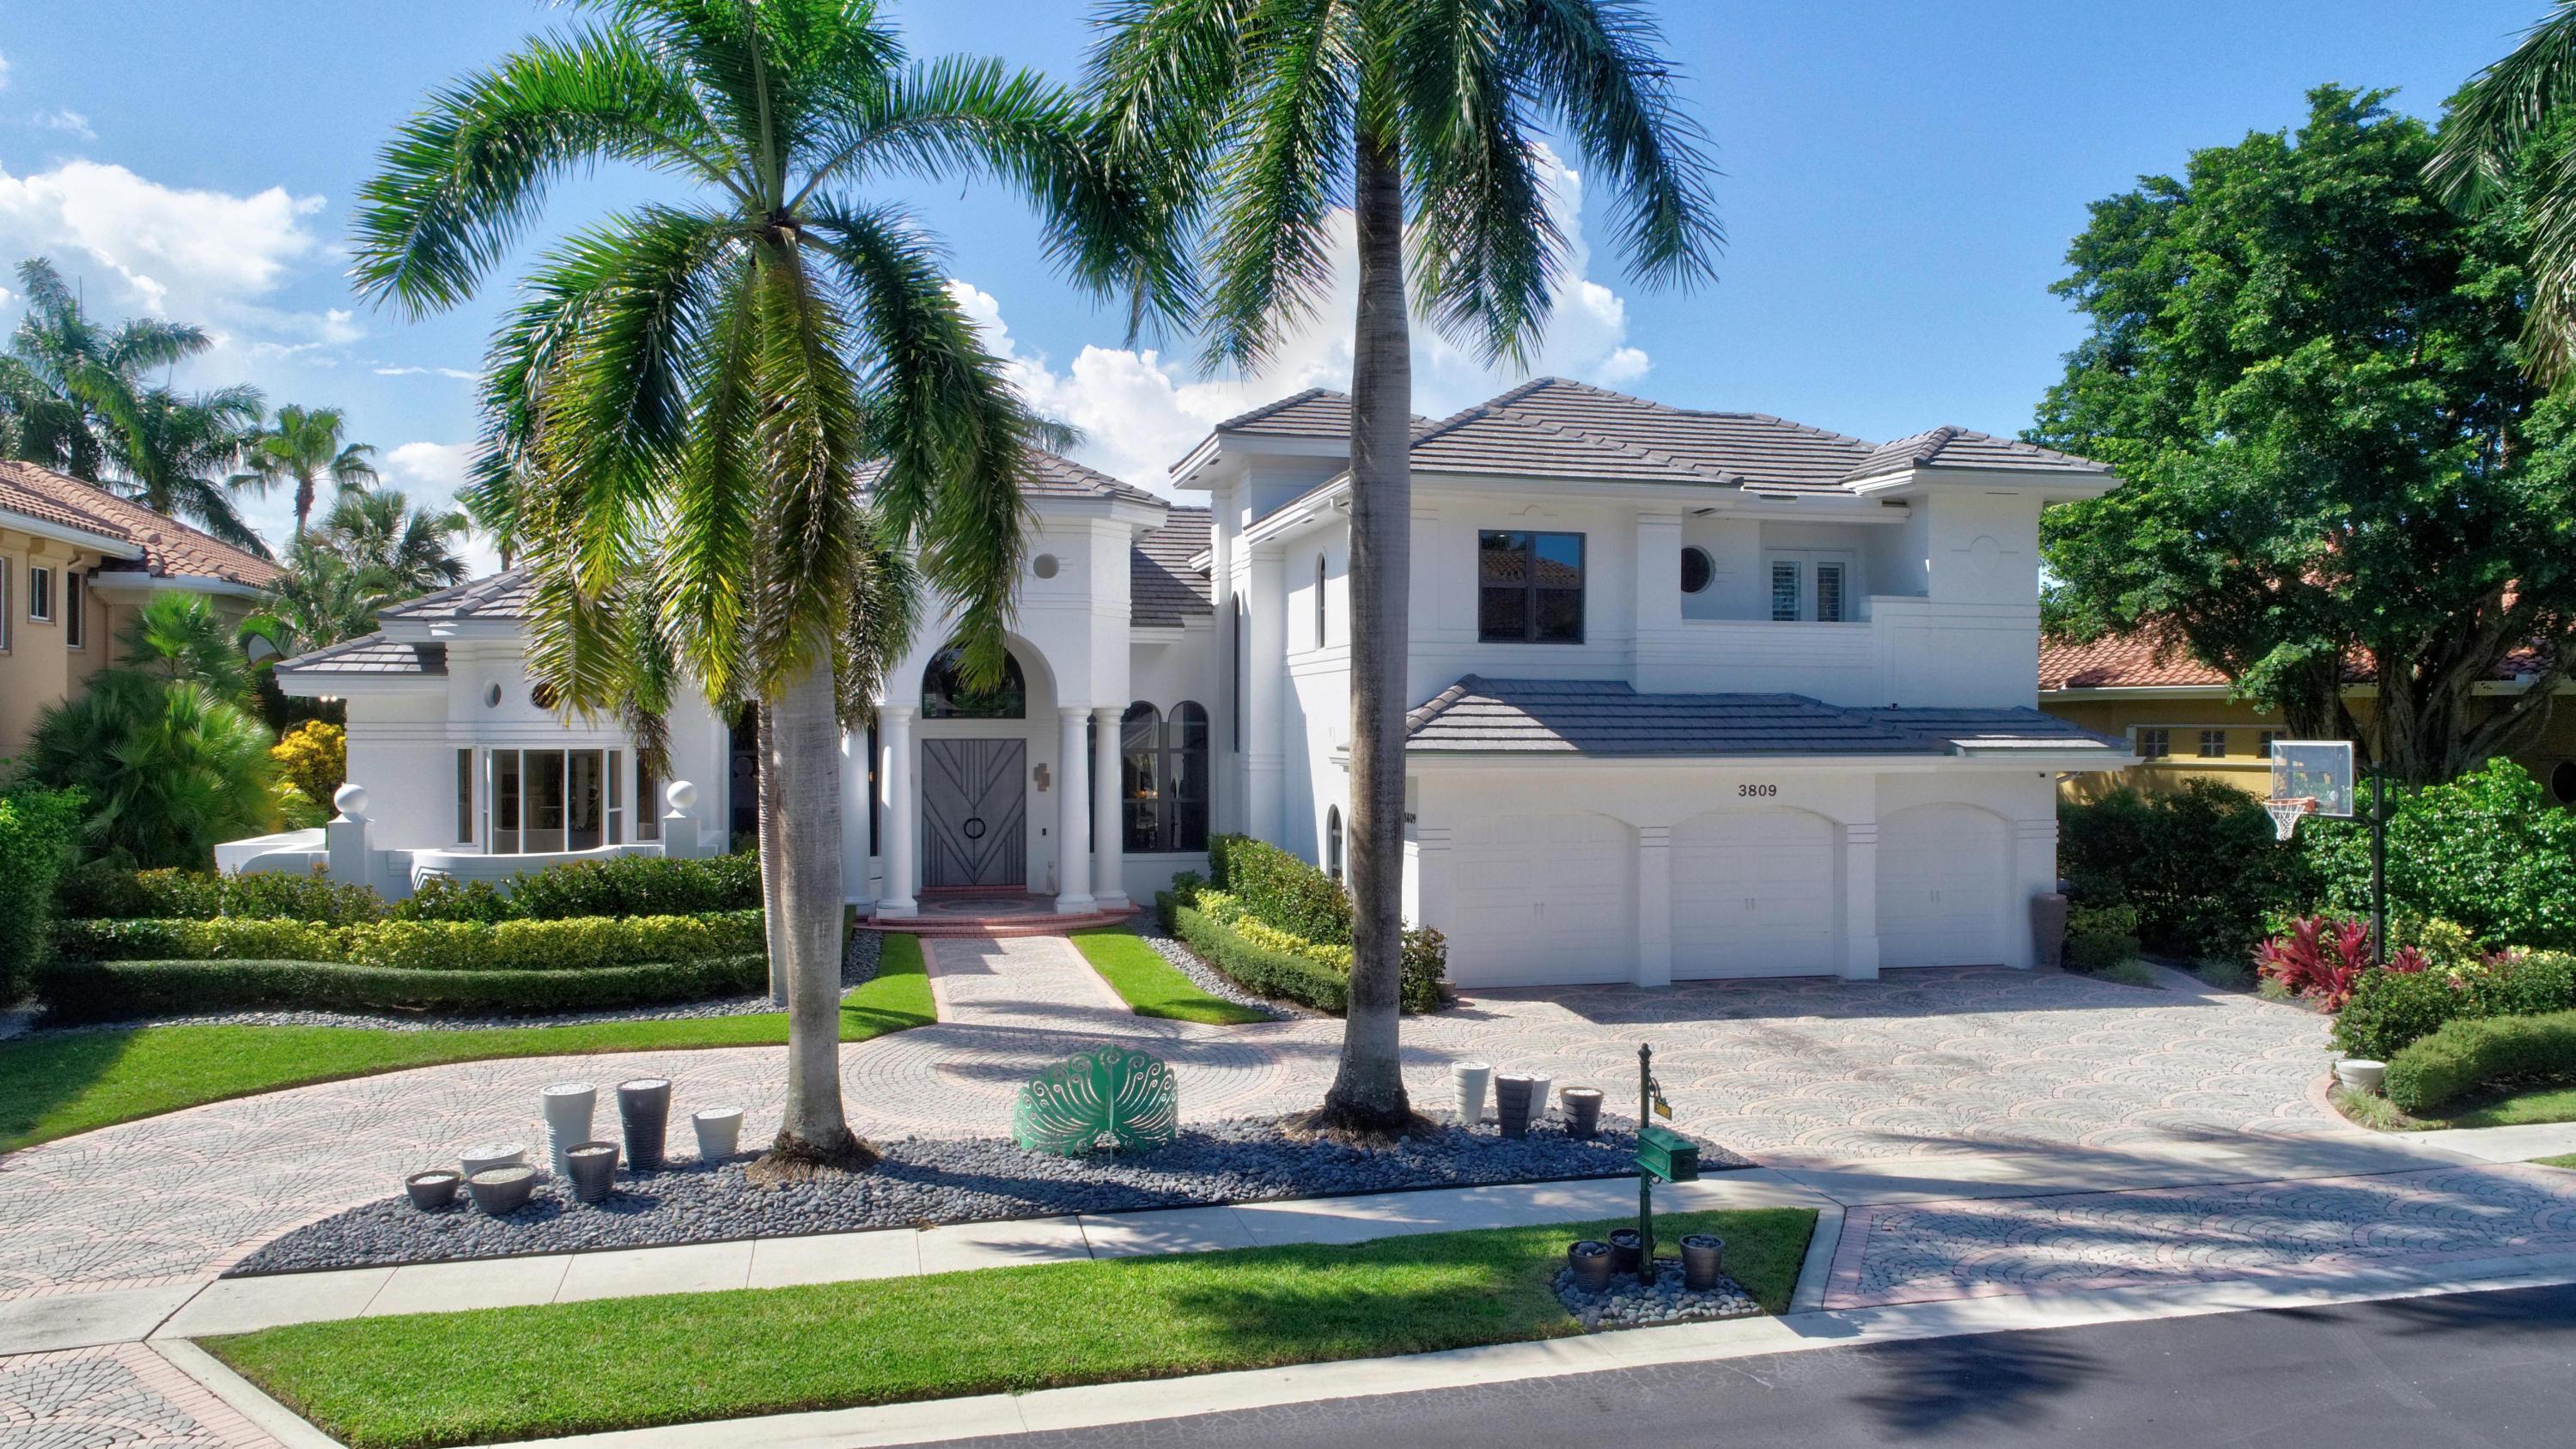 Photo of 3809 Coventry Lane, Boca Raton, FL 33496